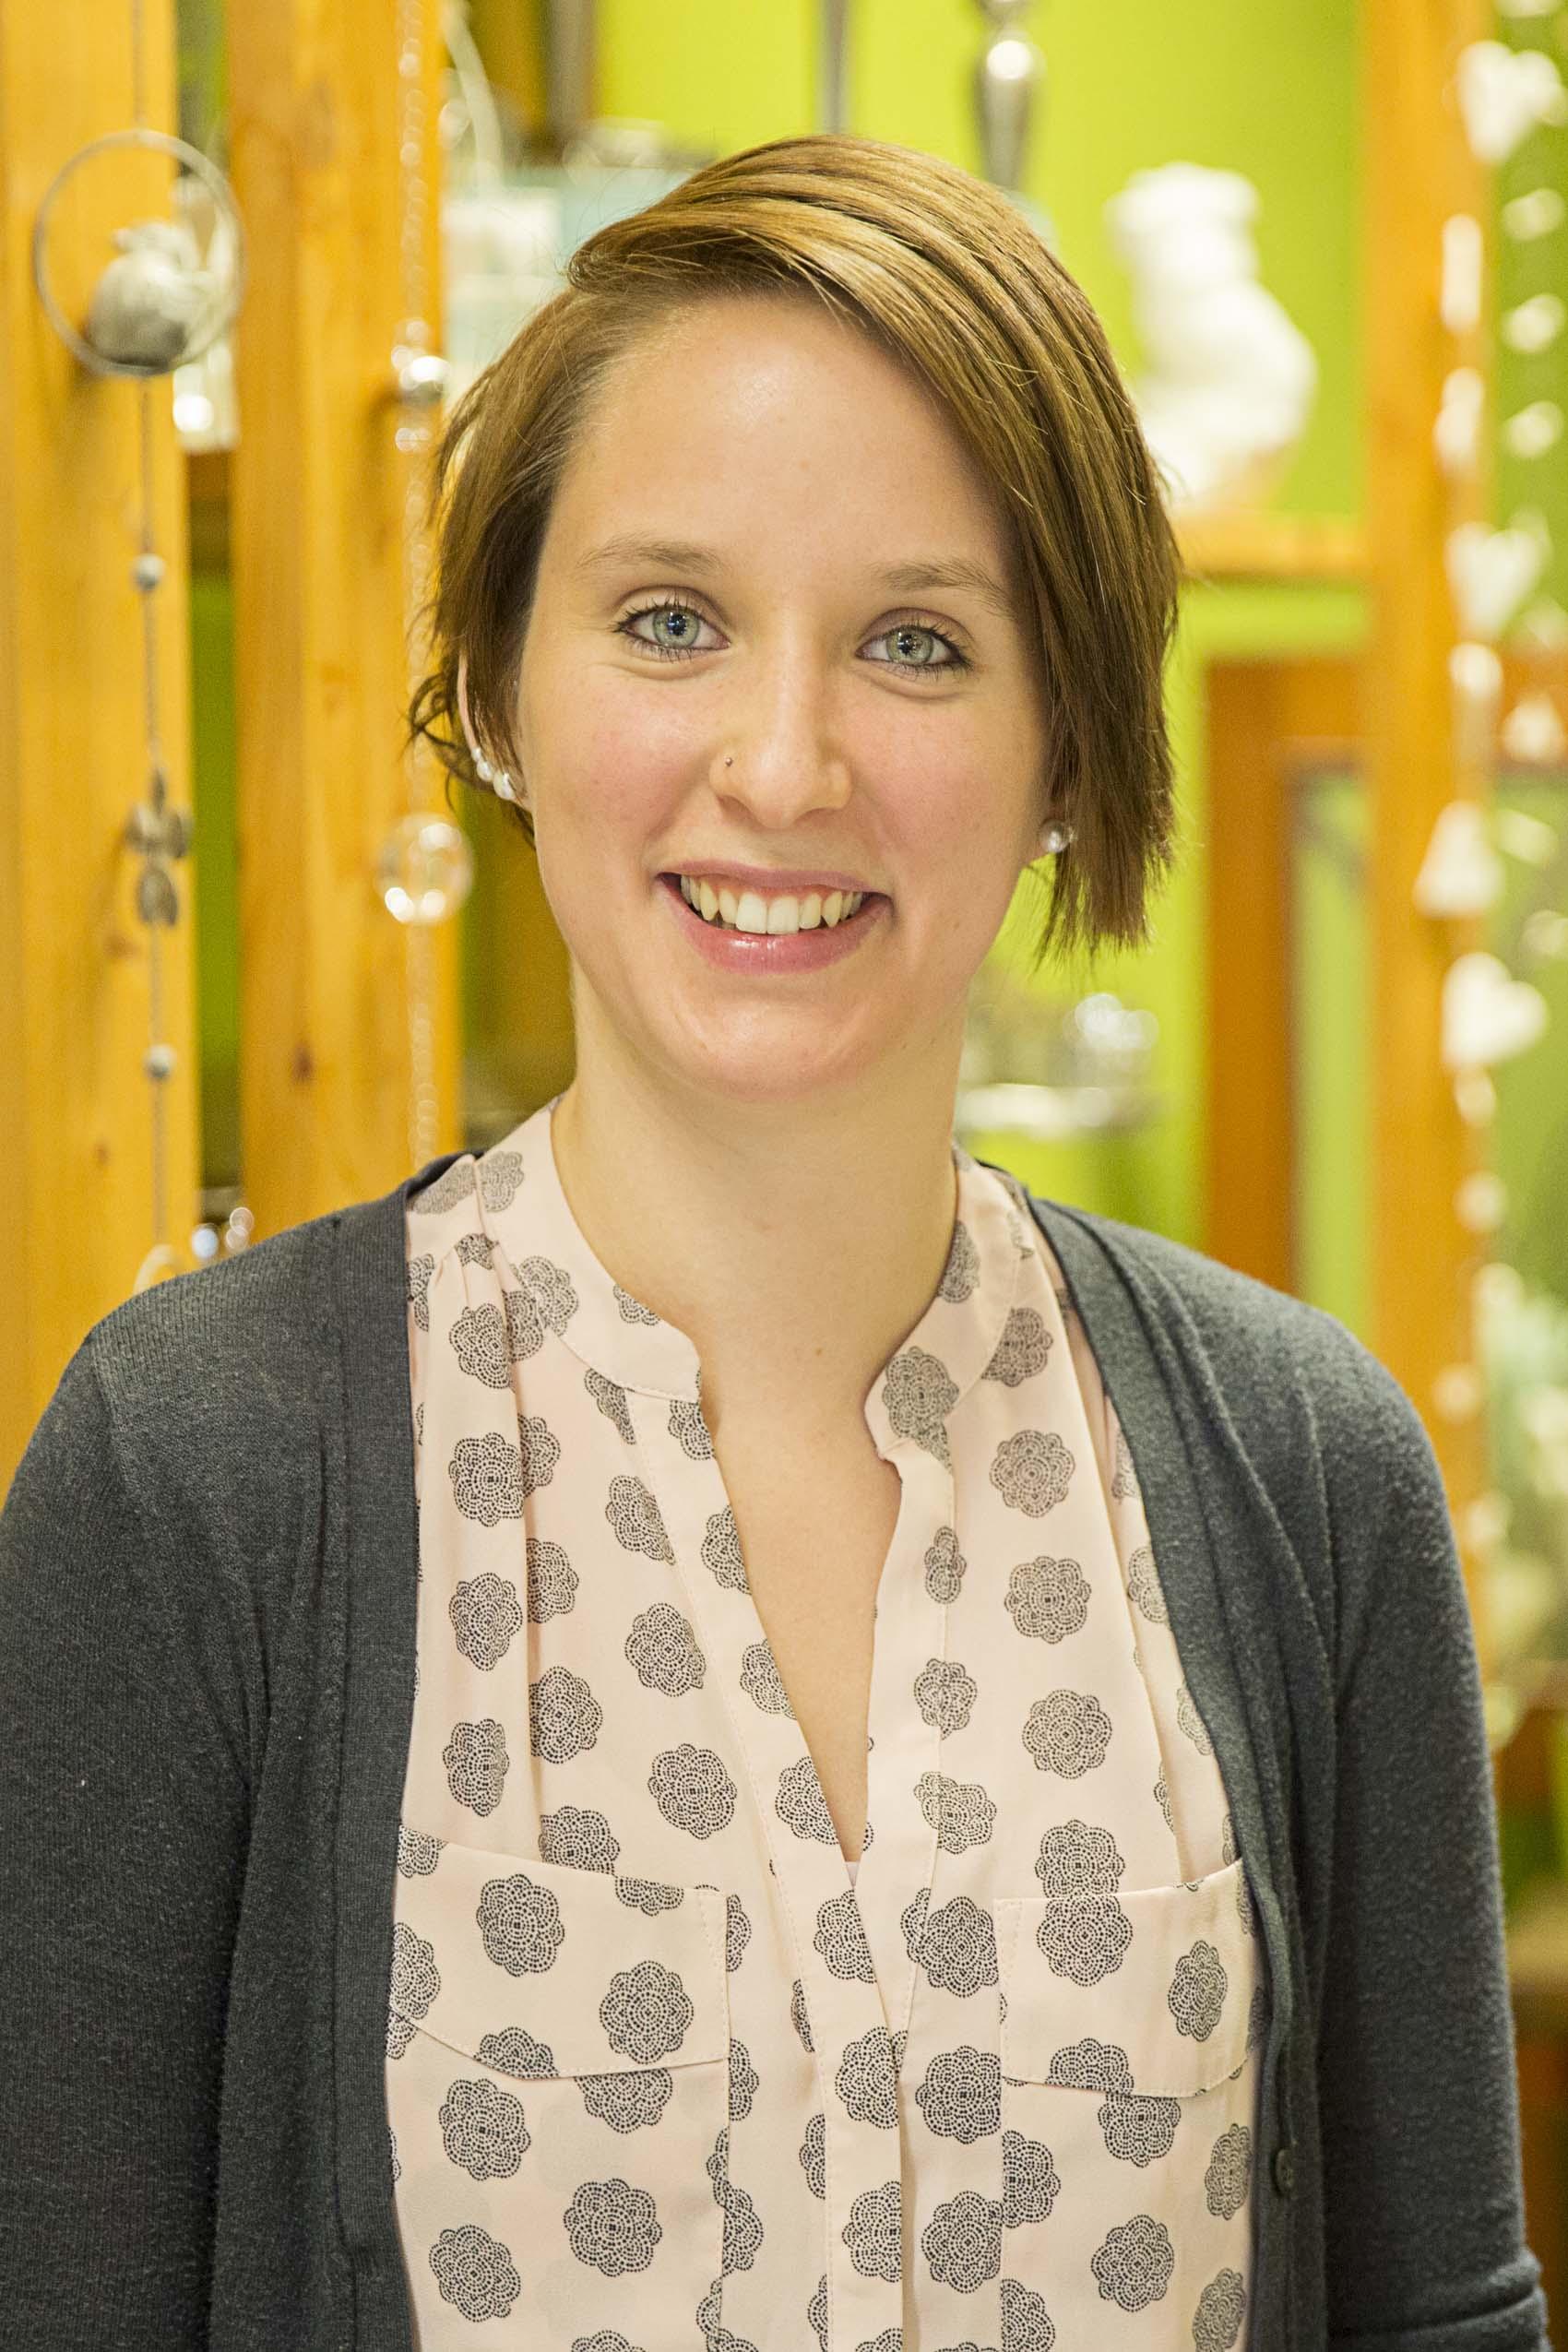 Natalie Howald